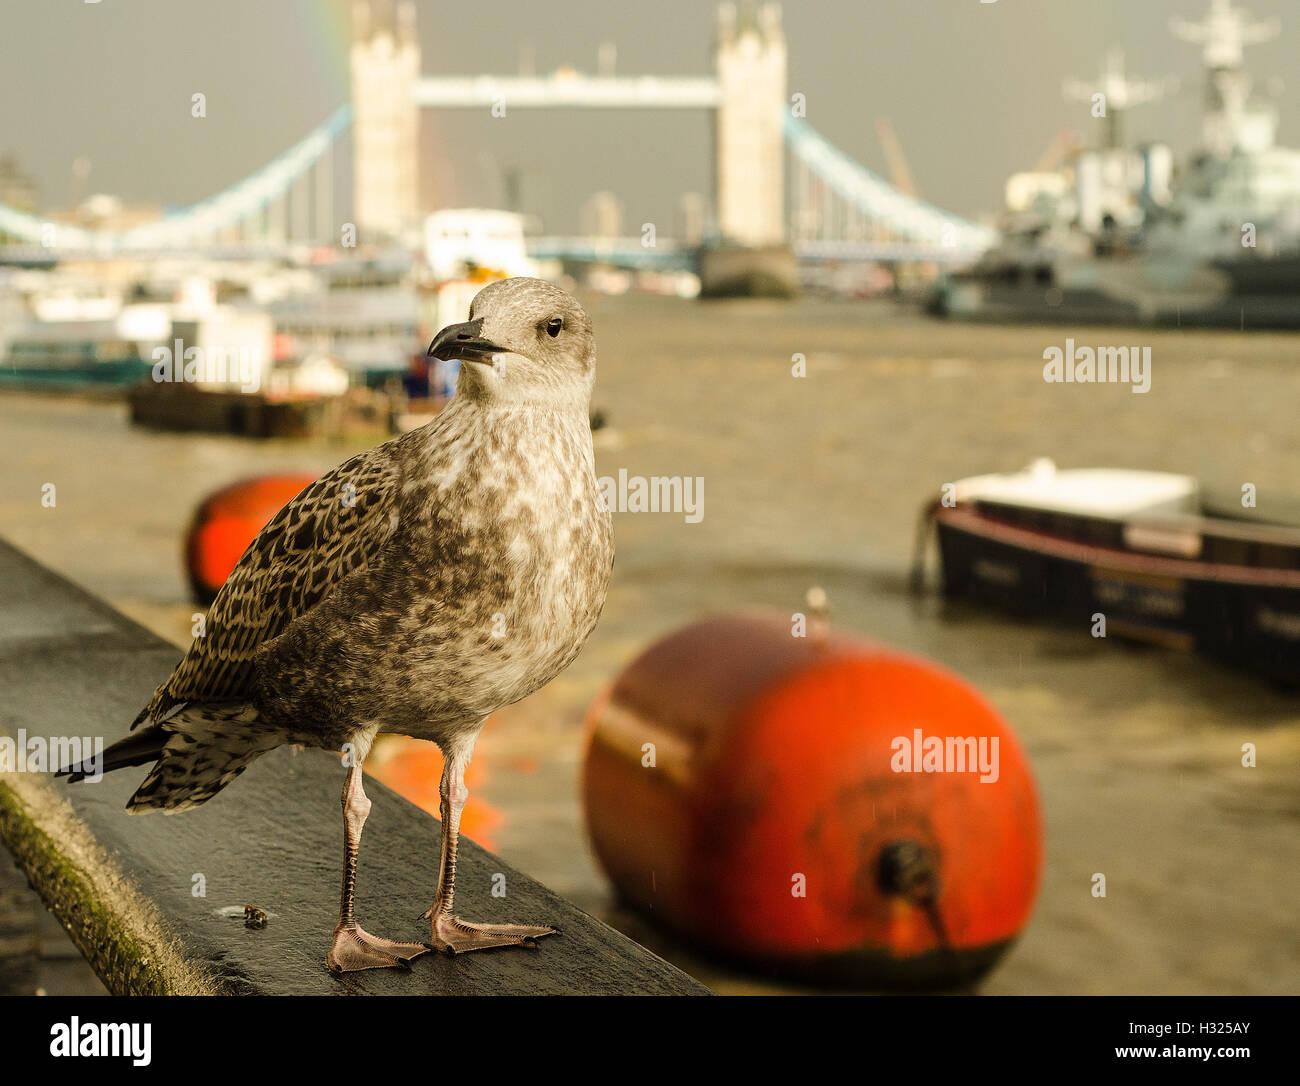 Seagull, Thames River, London - Stock Image